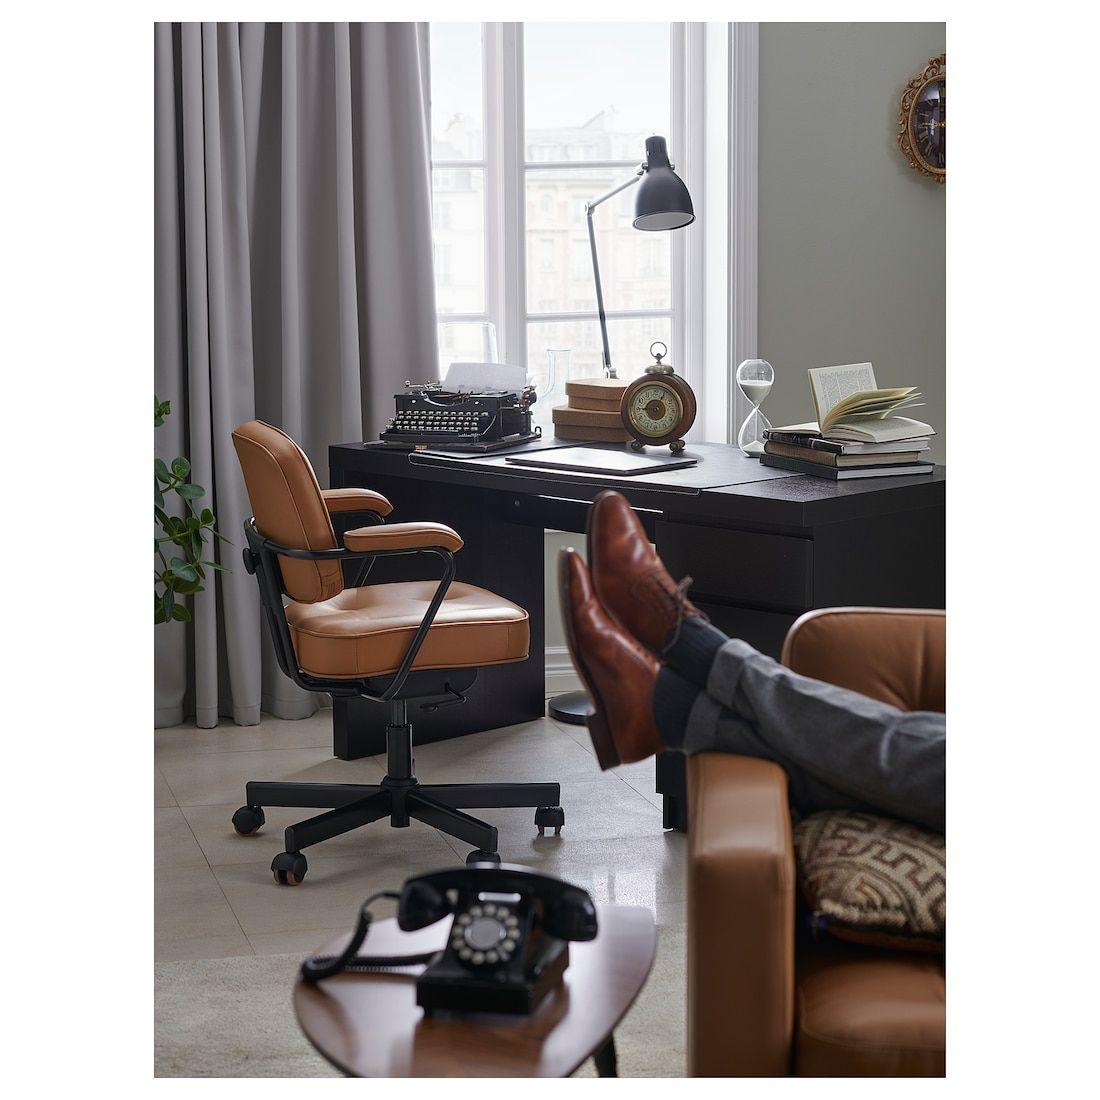 ALEFJÄLL Office chair Grann golden brown in 2020